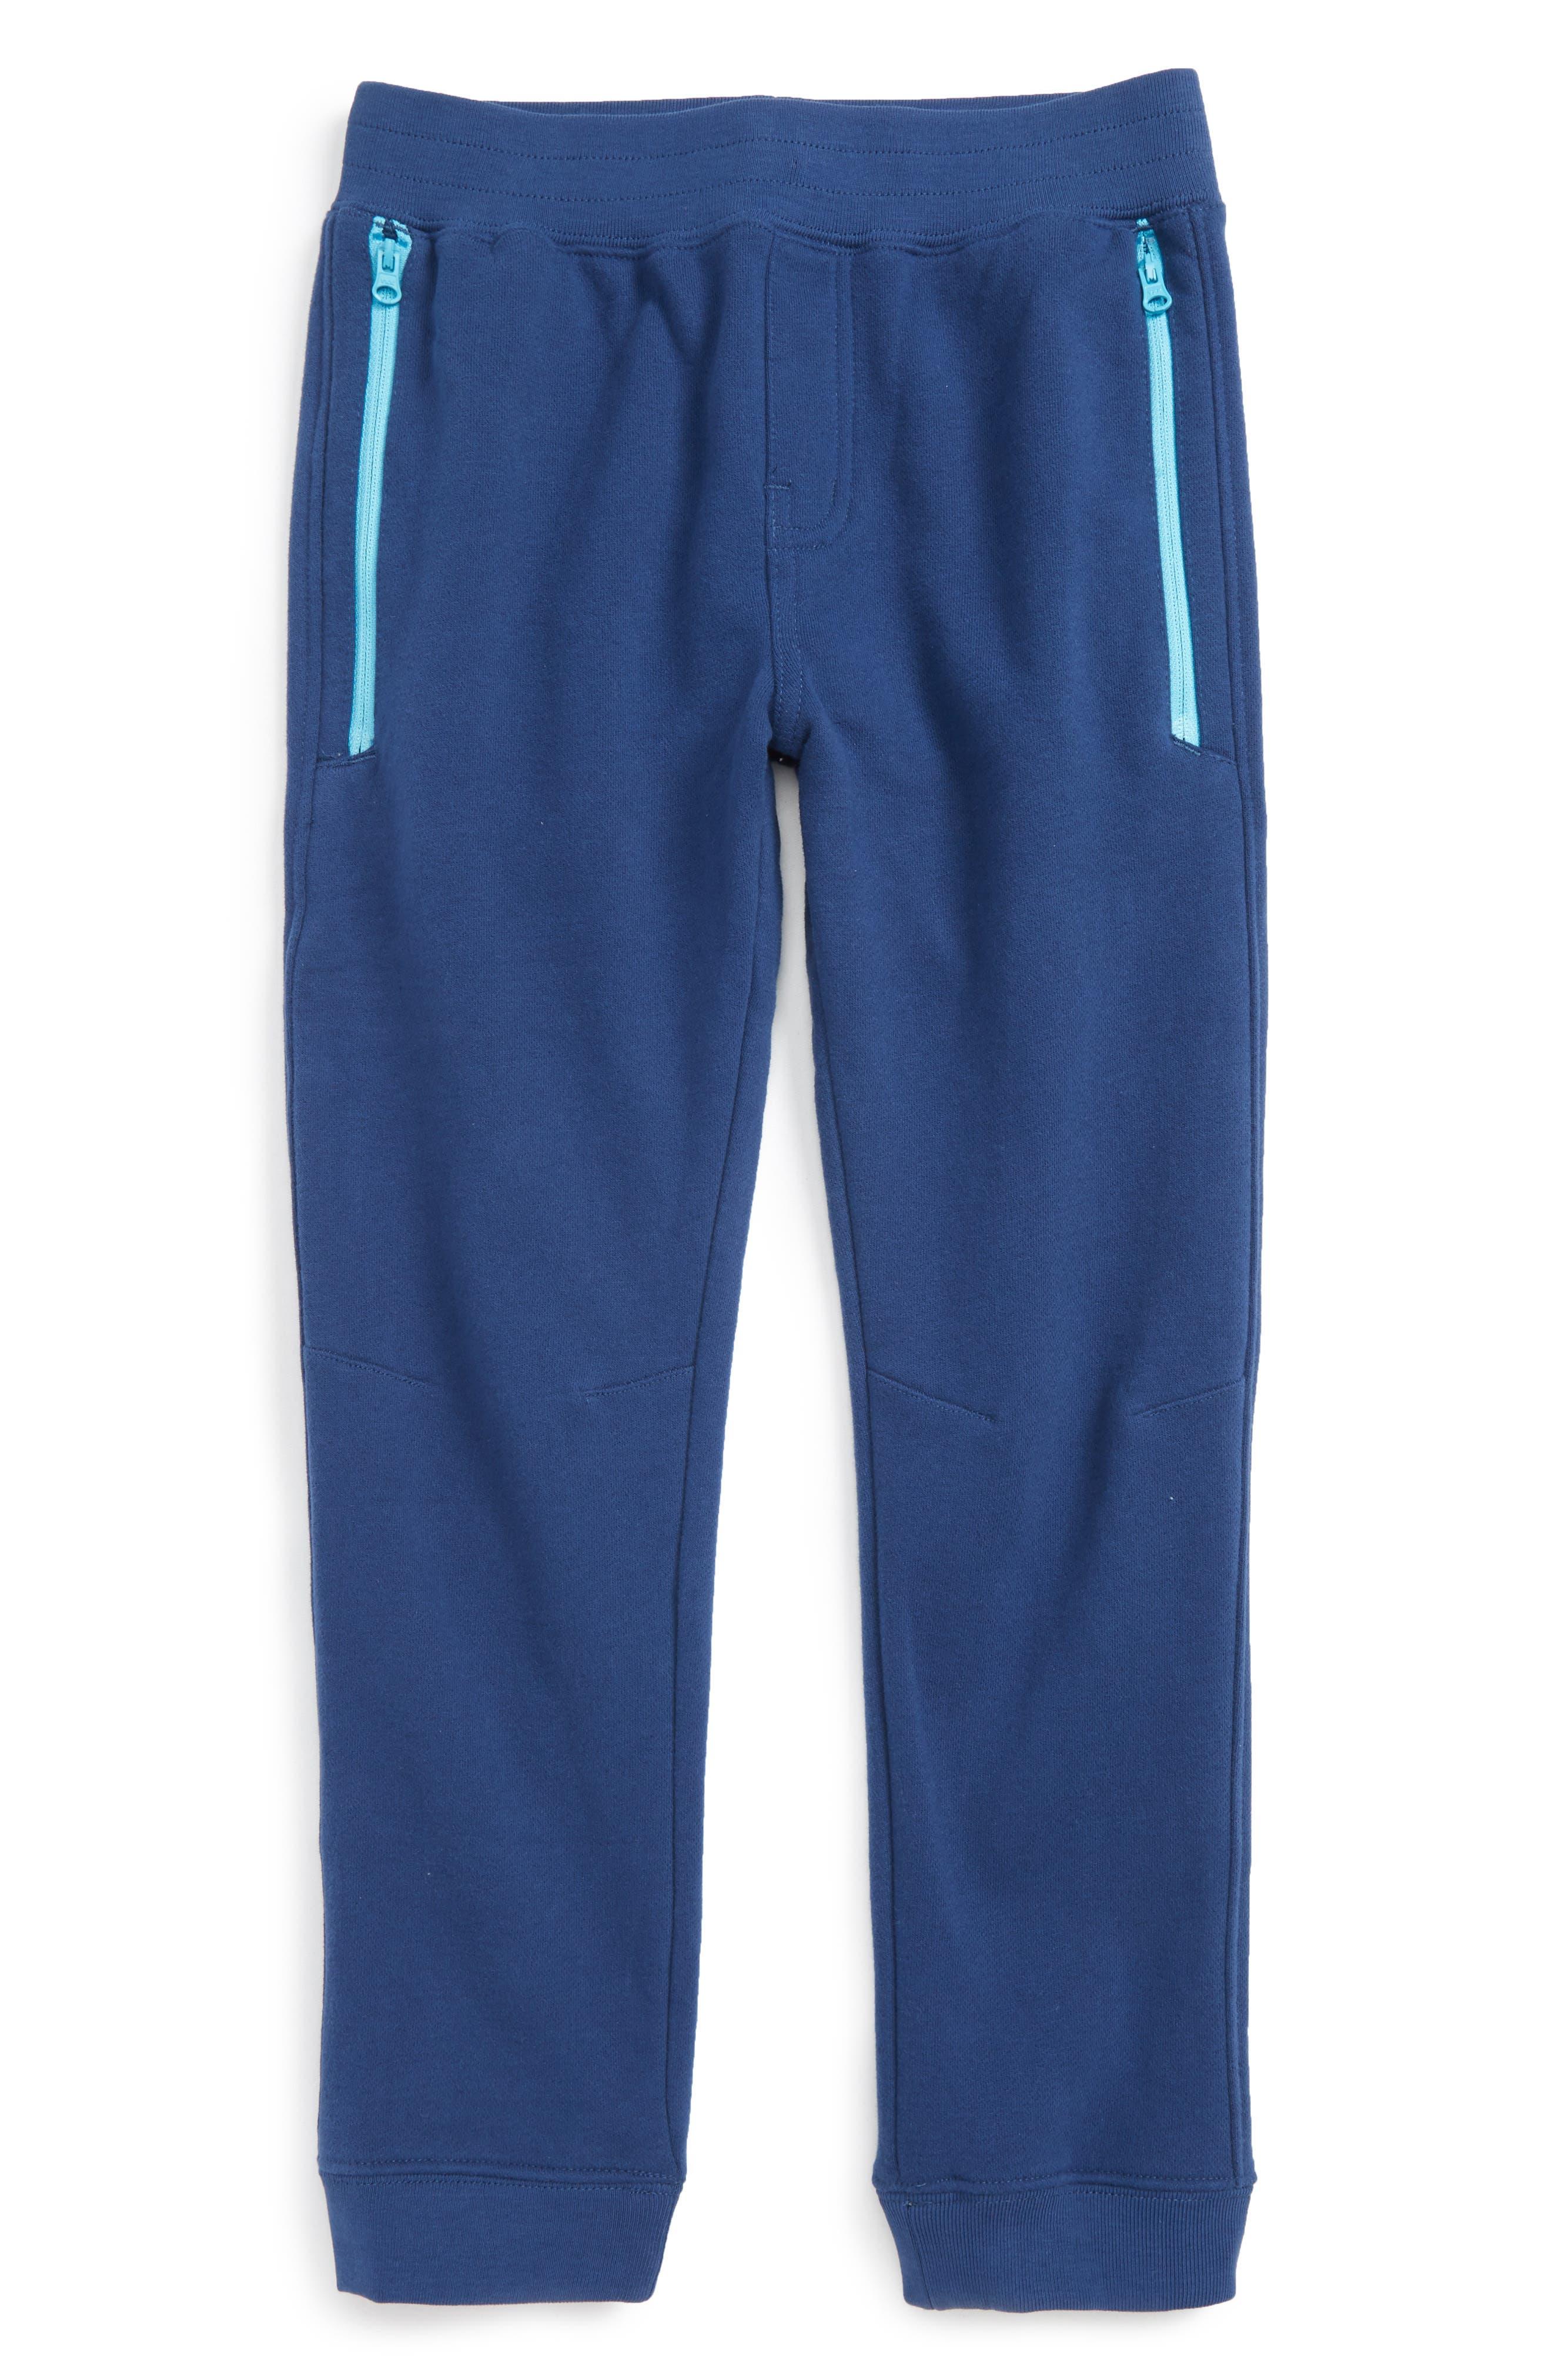 Tea Collection Zip Pocket Jogger Pants (Toddler Boys & Little Boys)